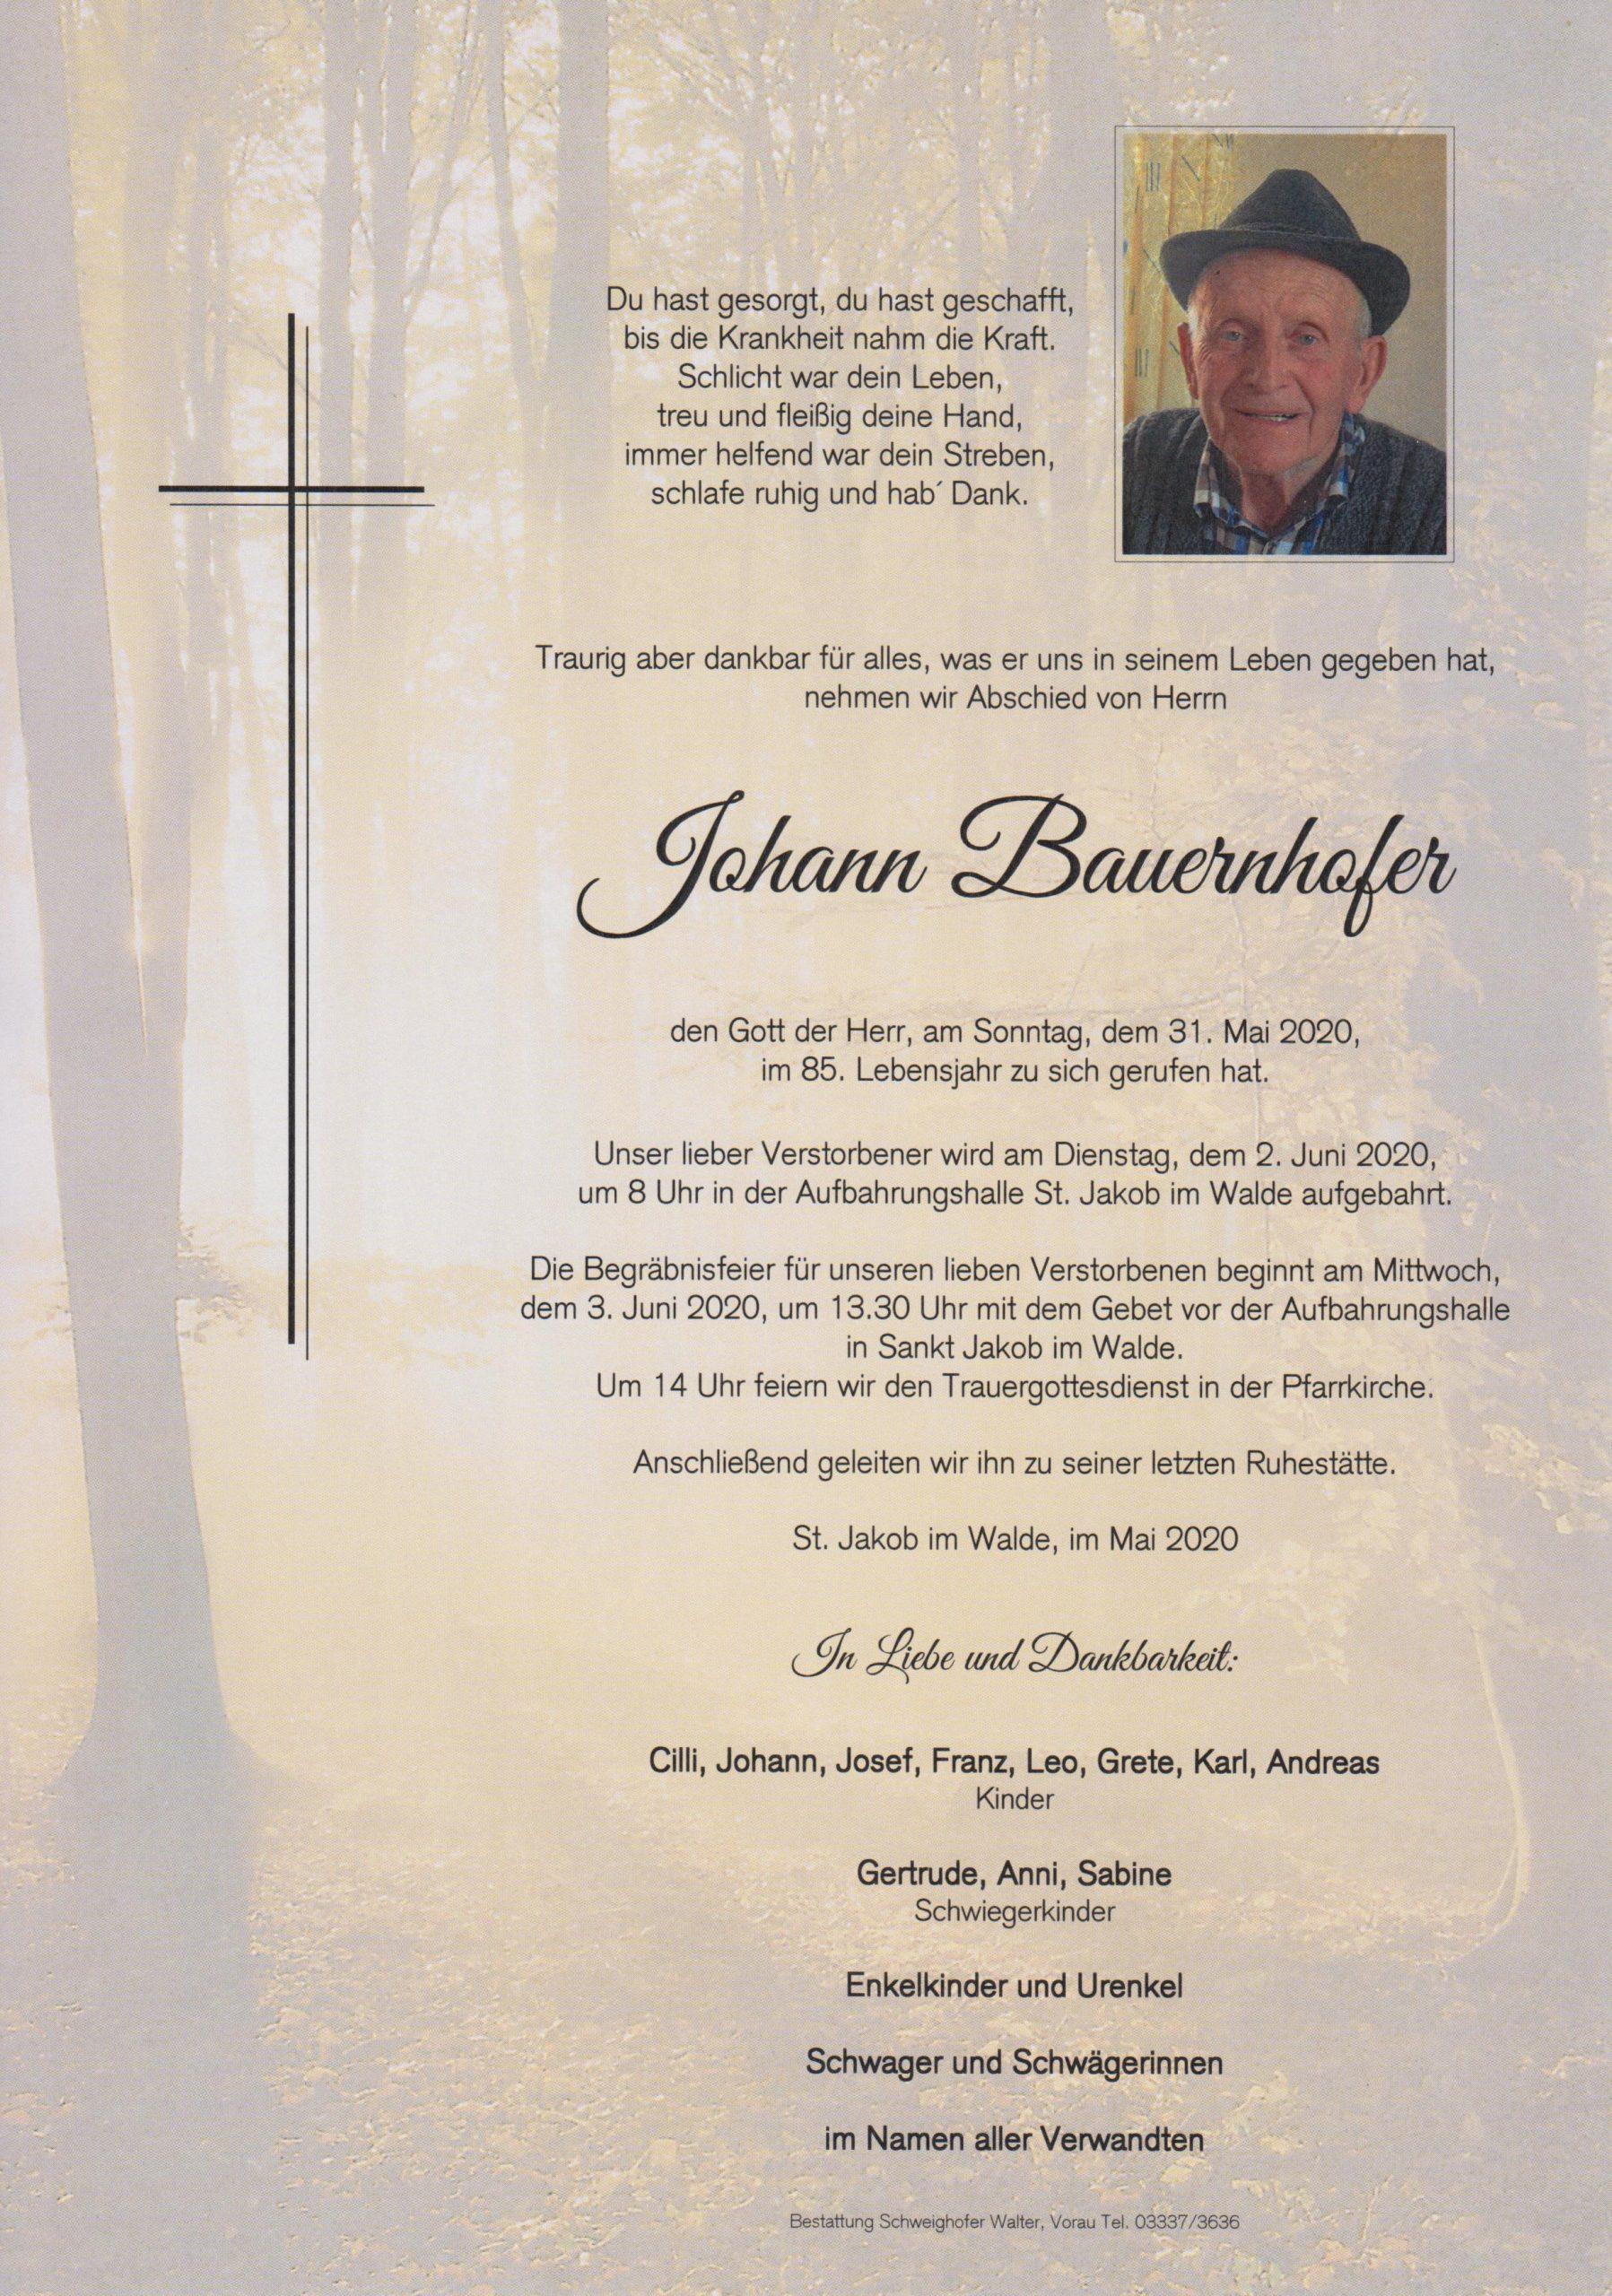 Johann Bauernhofer